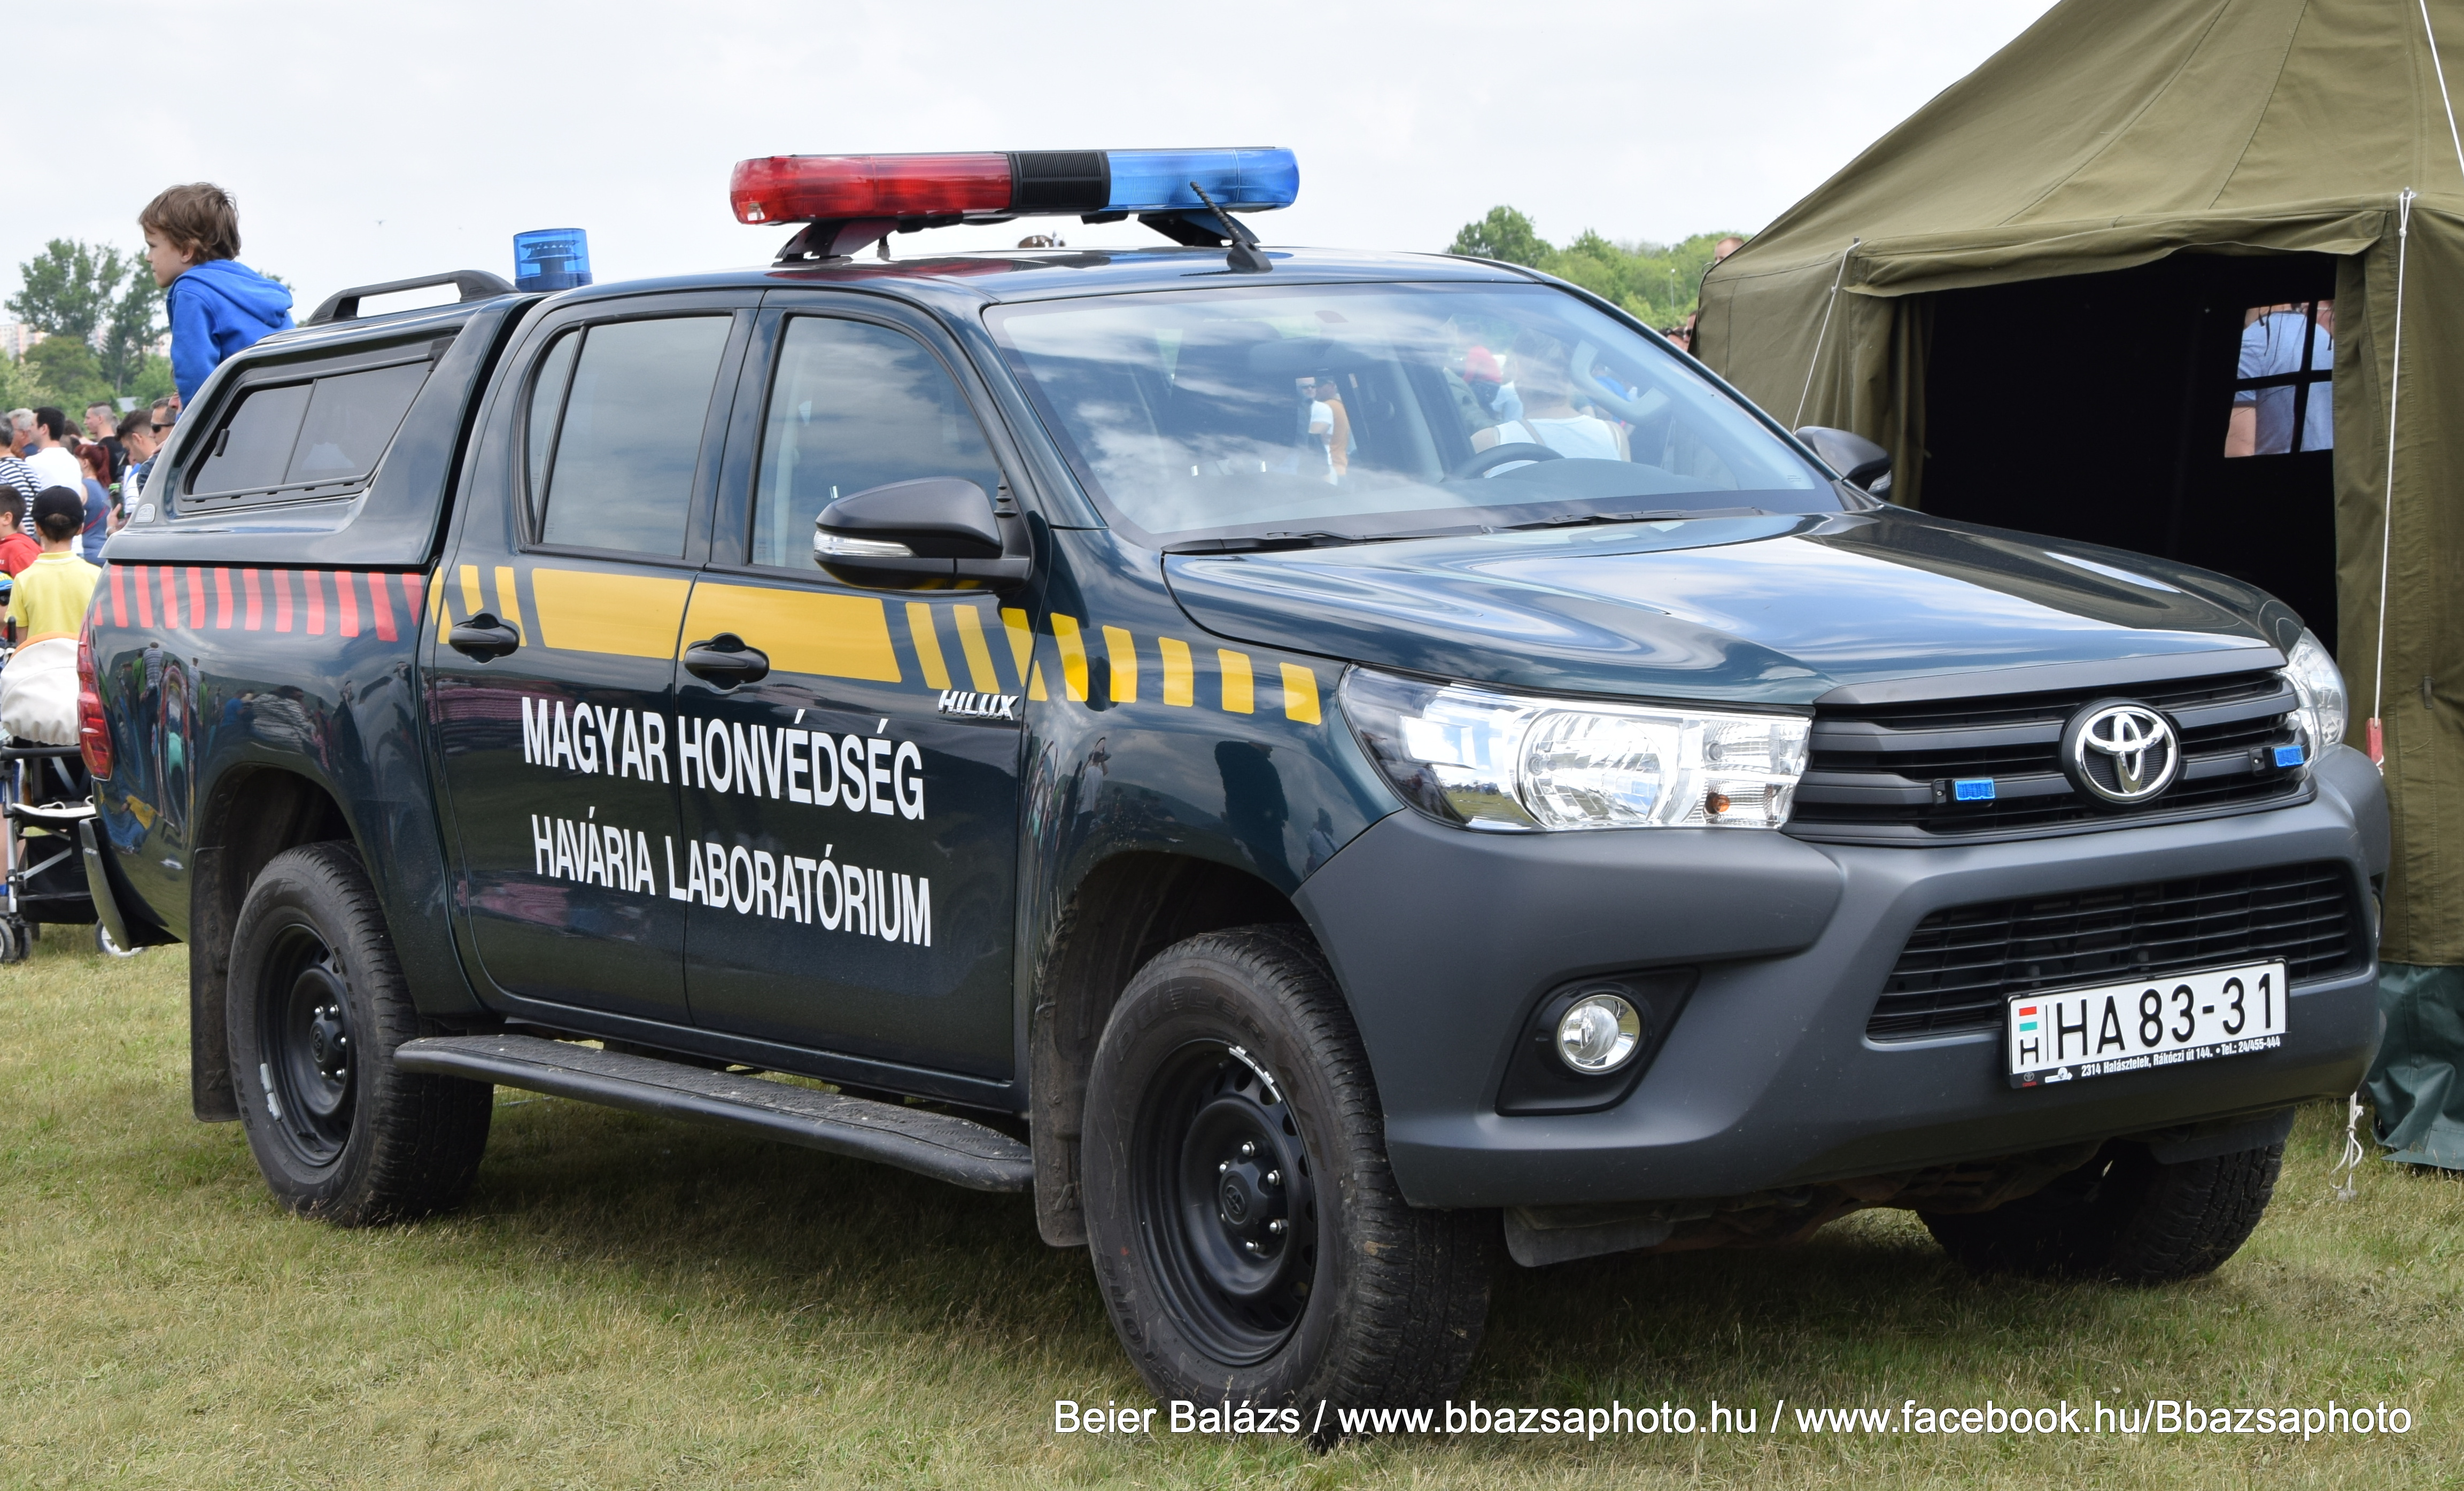 Toyota Hilux – Havária Laboratórium